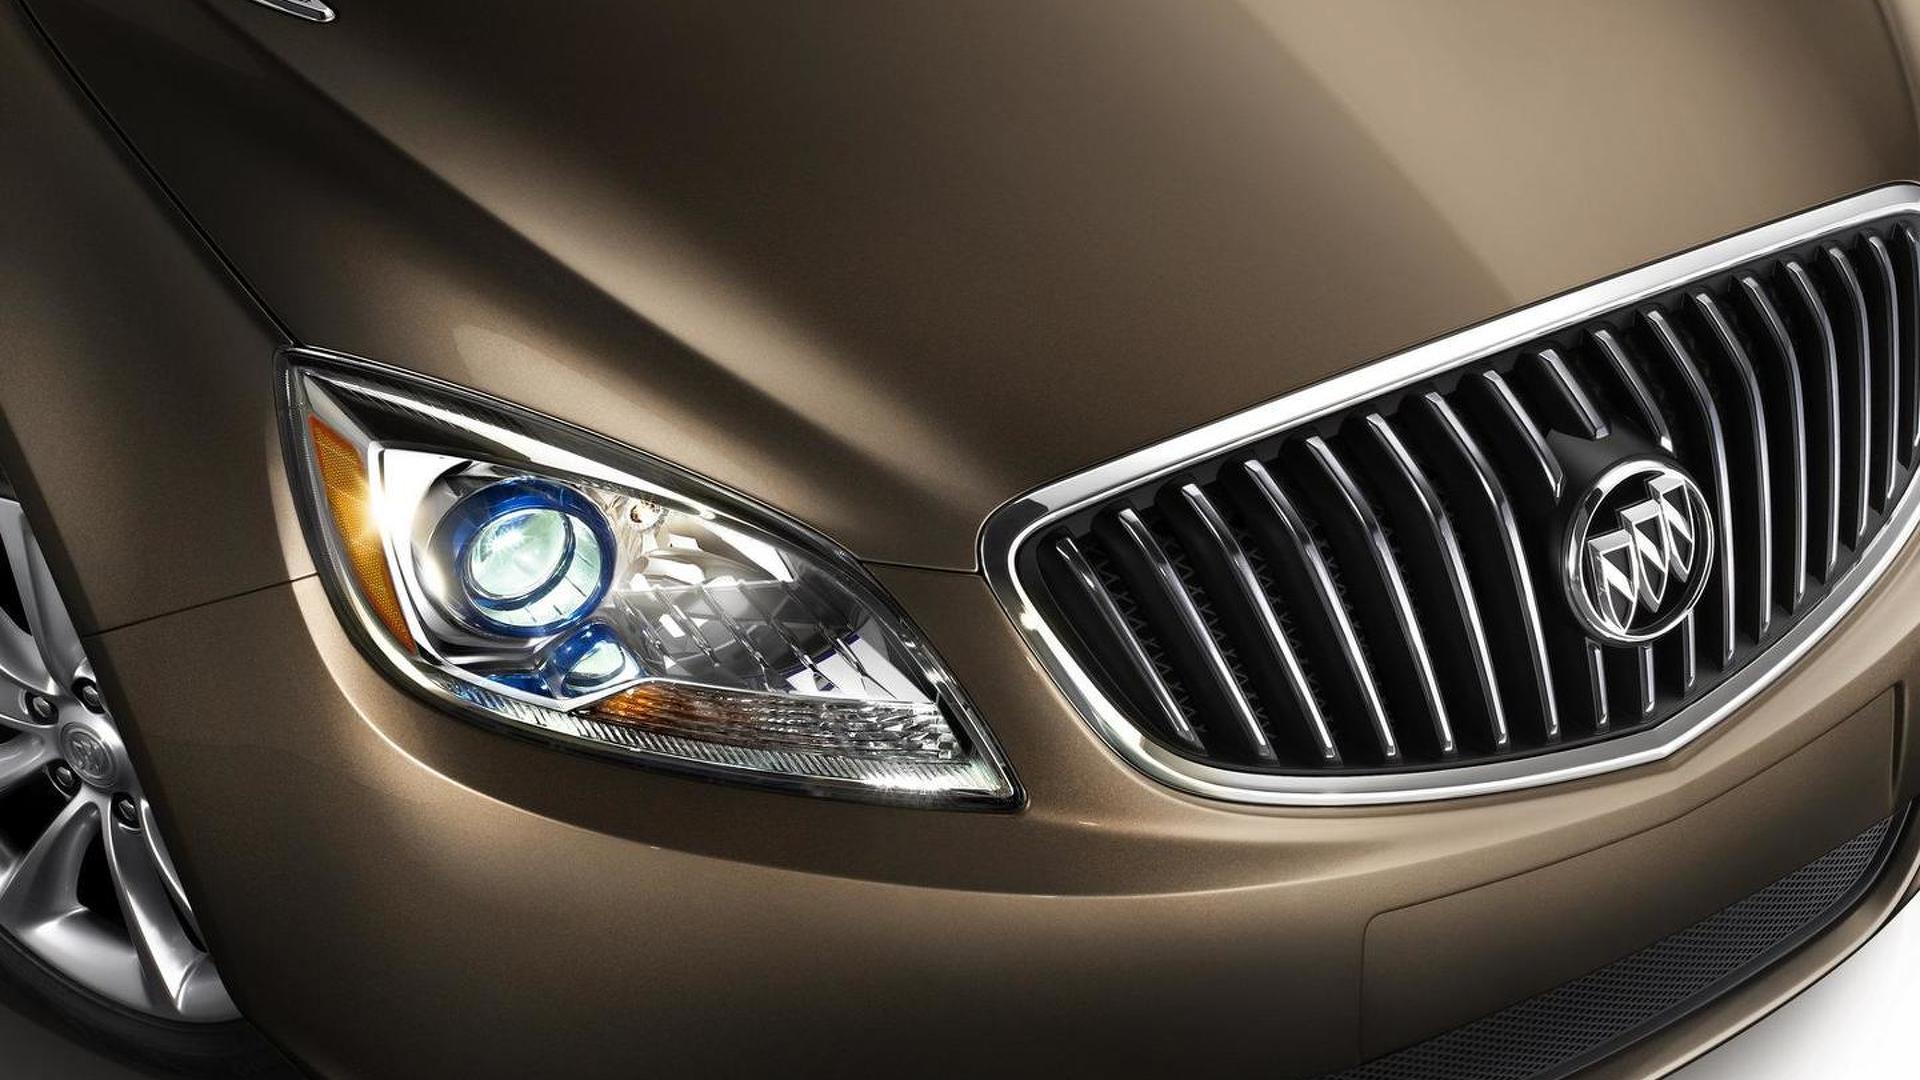 2012 Buick Verano Teased